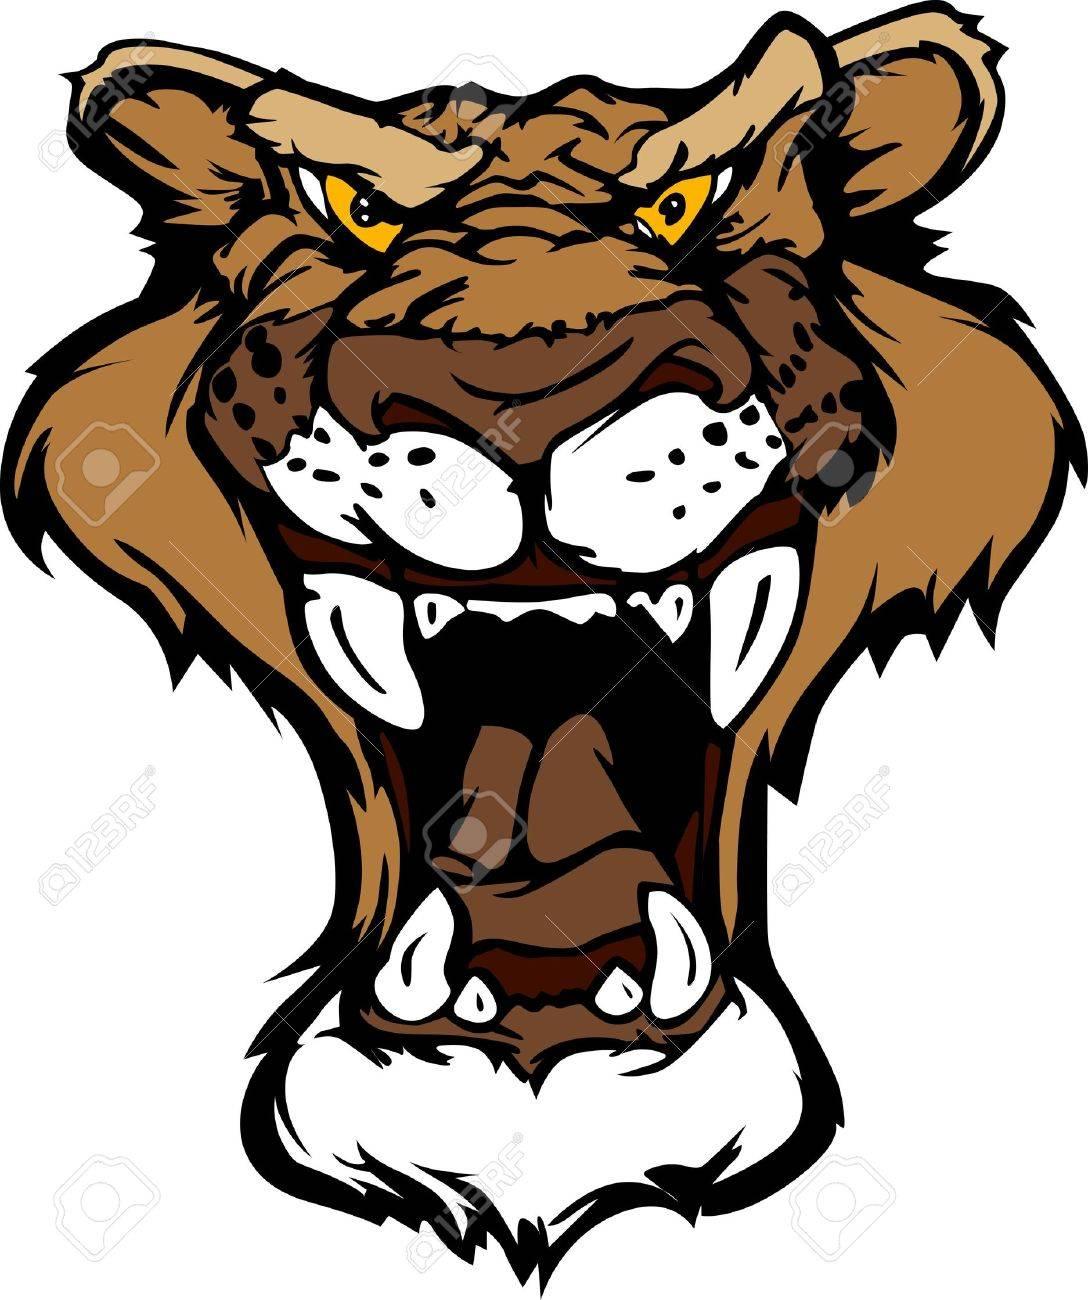 cartoon mascot image of a mountain lion head royalty free cliparts rh 123rf com Cartoon Bobcat Cartoon Coyote